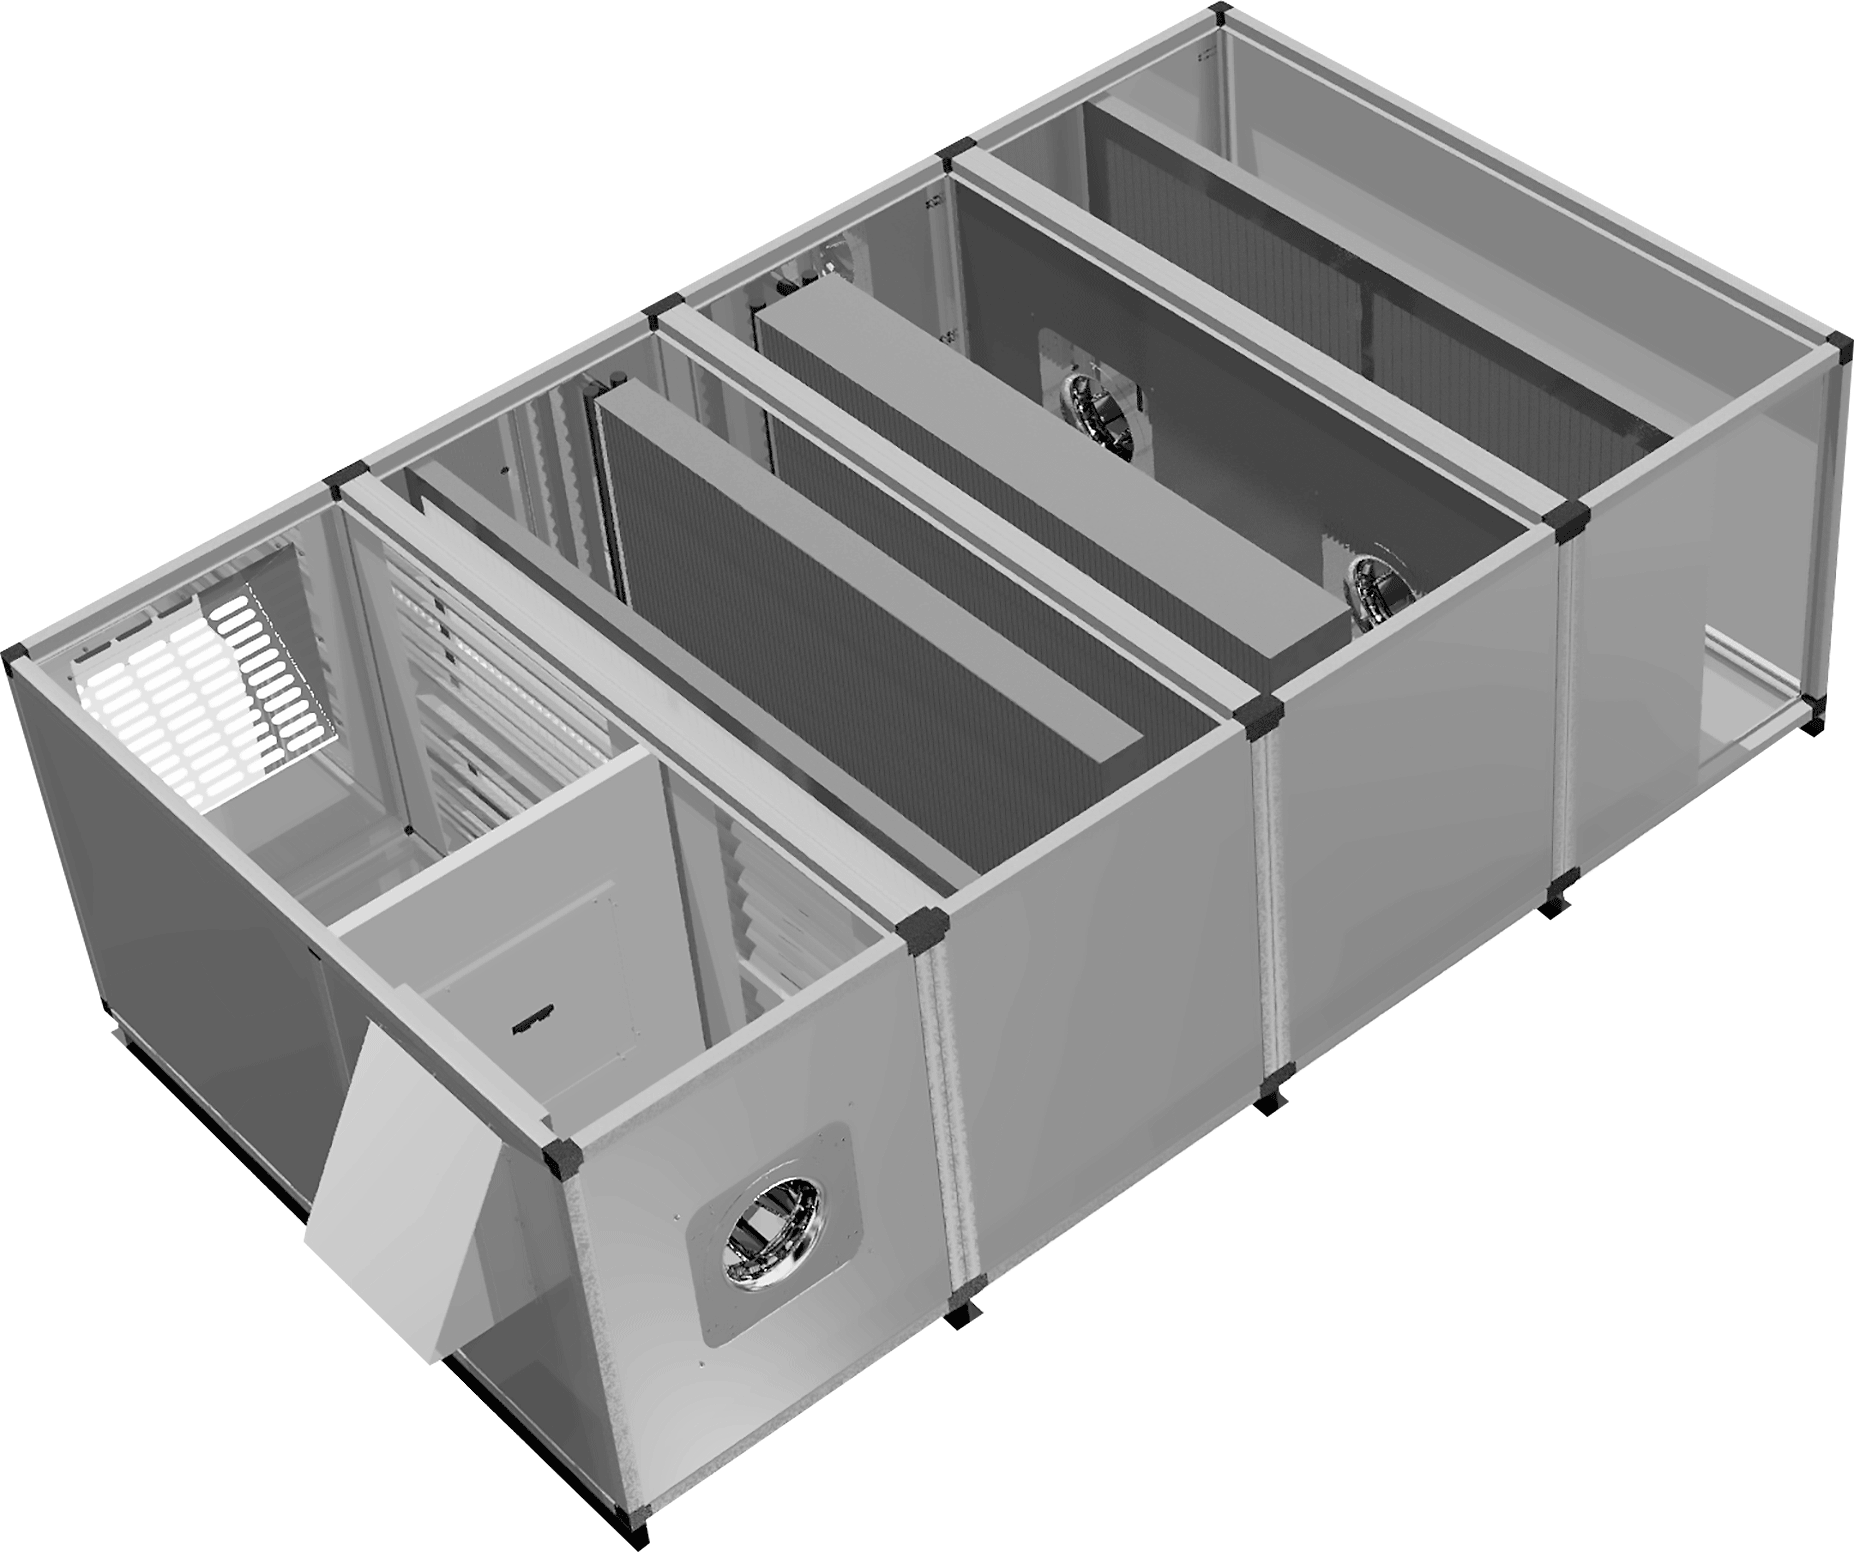 Custom Air Handling Units - Air handling unit 4